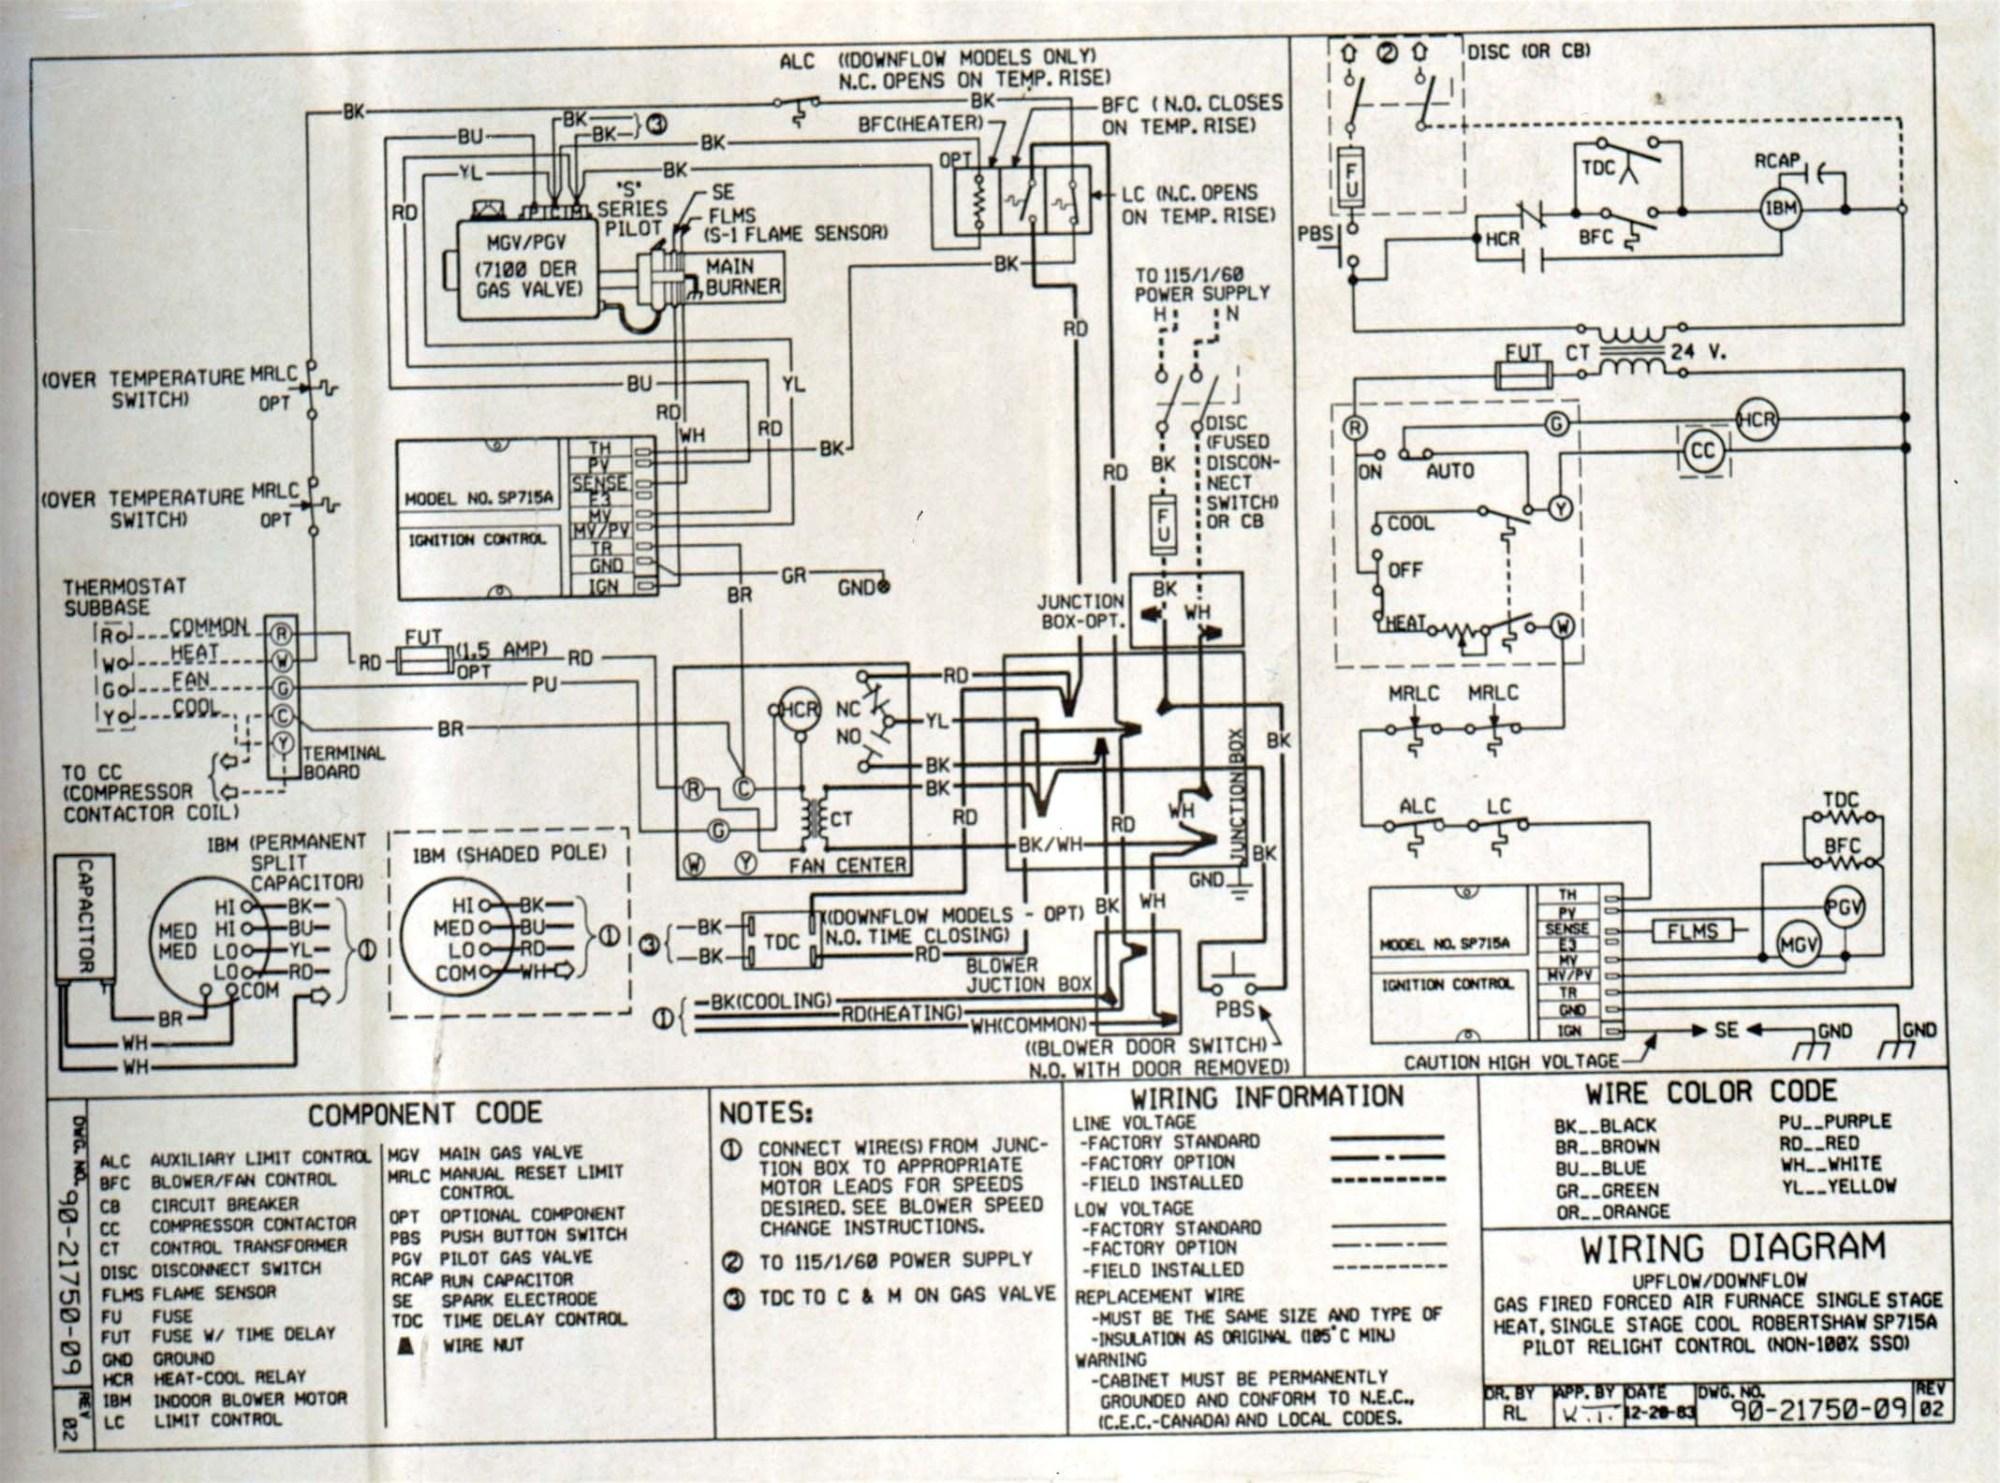 hight resolution of goodman a c wiring diagram wiring diagram schematicsgoodman ac wiring diagram free wiring diagram goodman calculation diagram